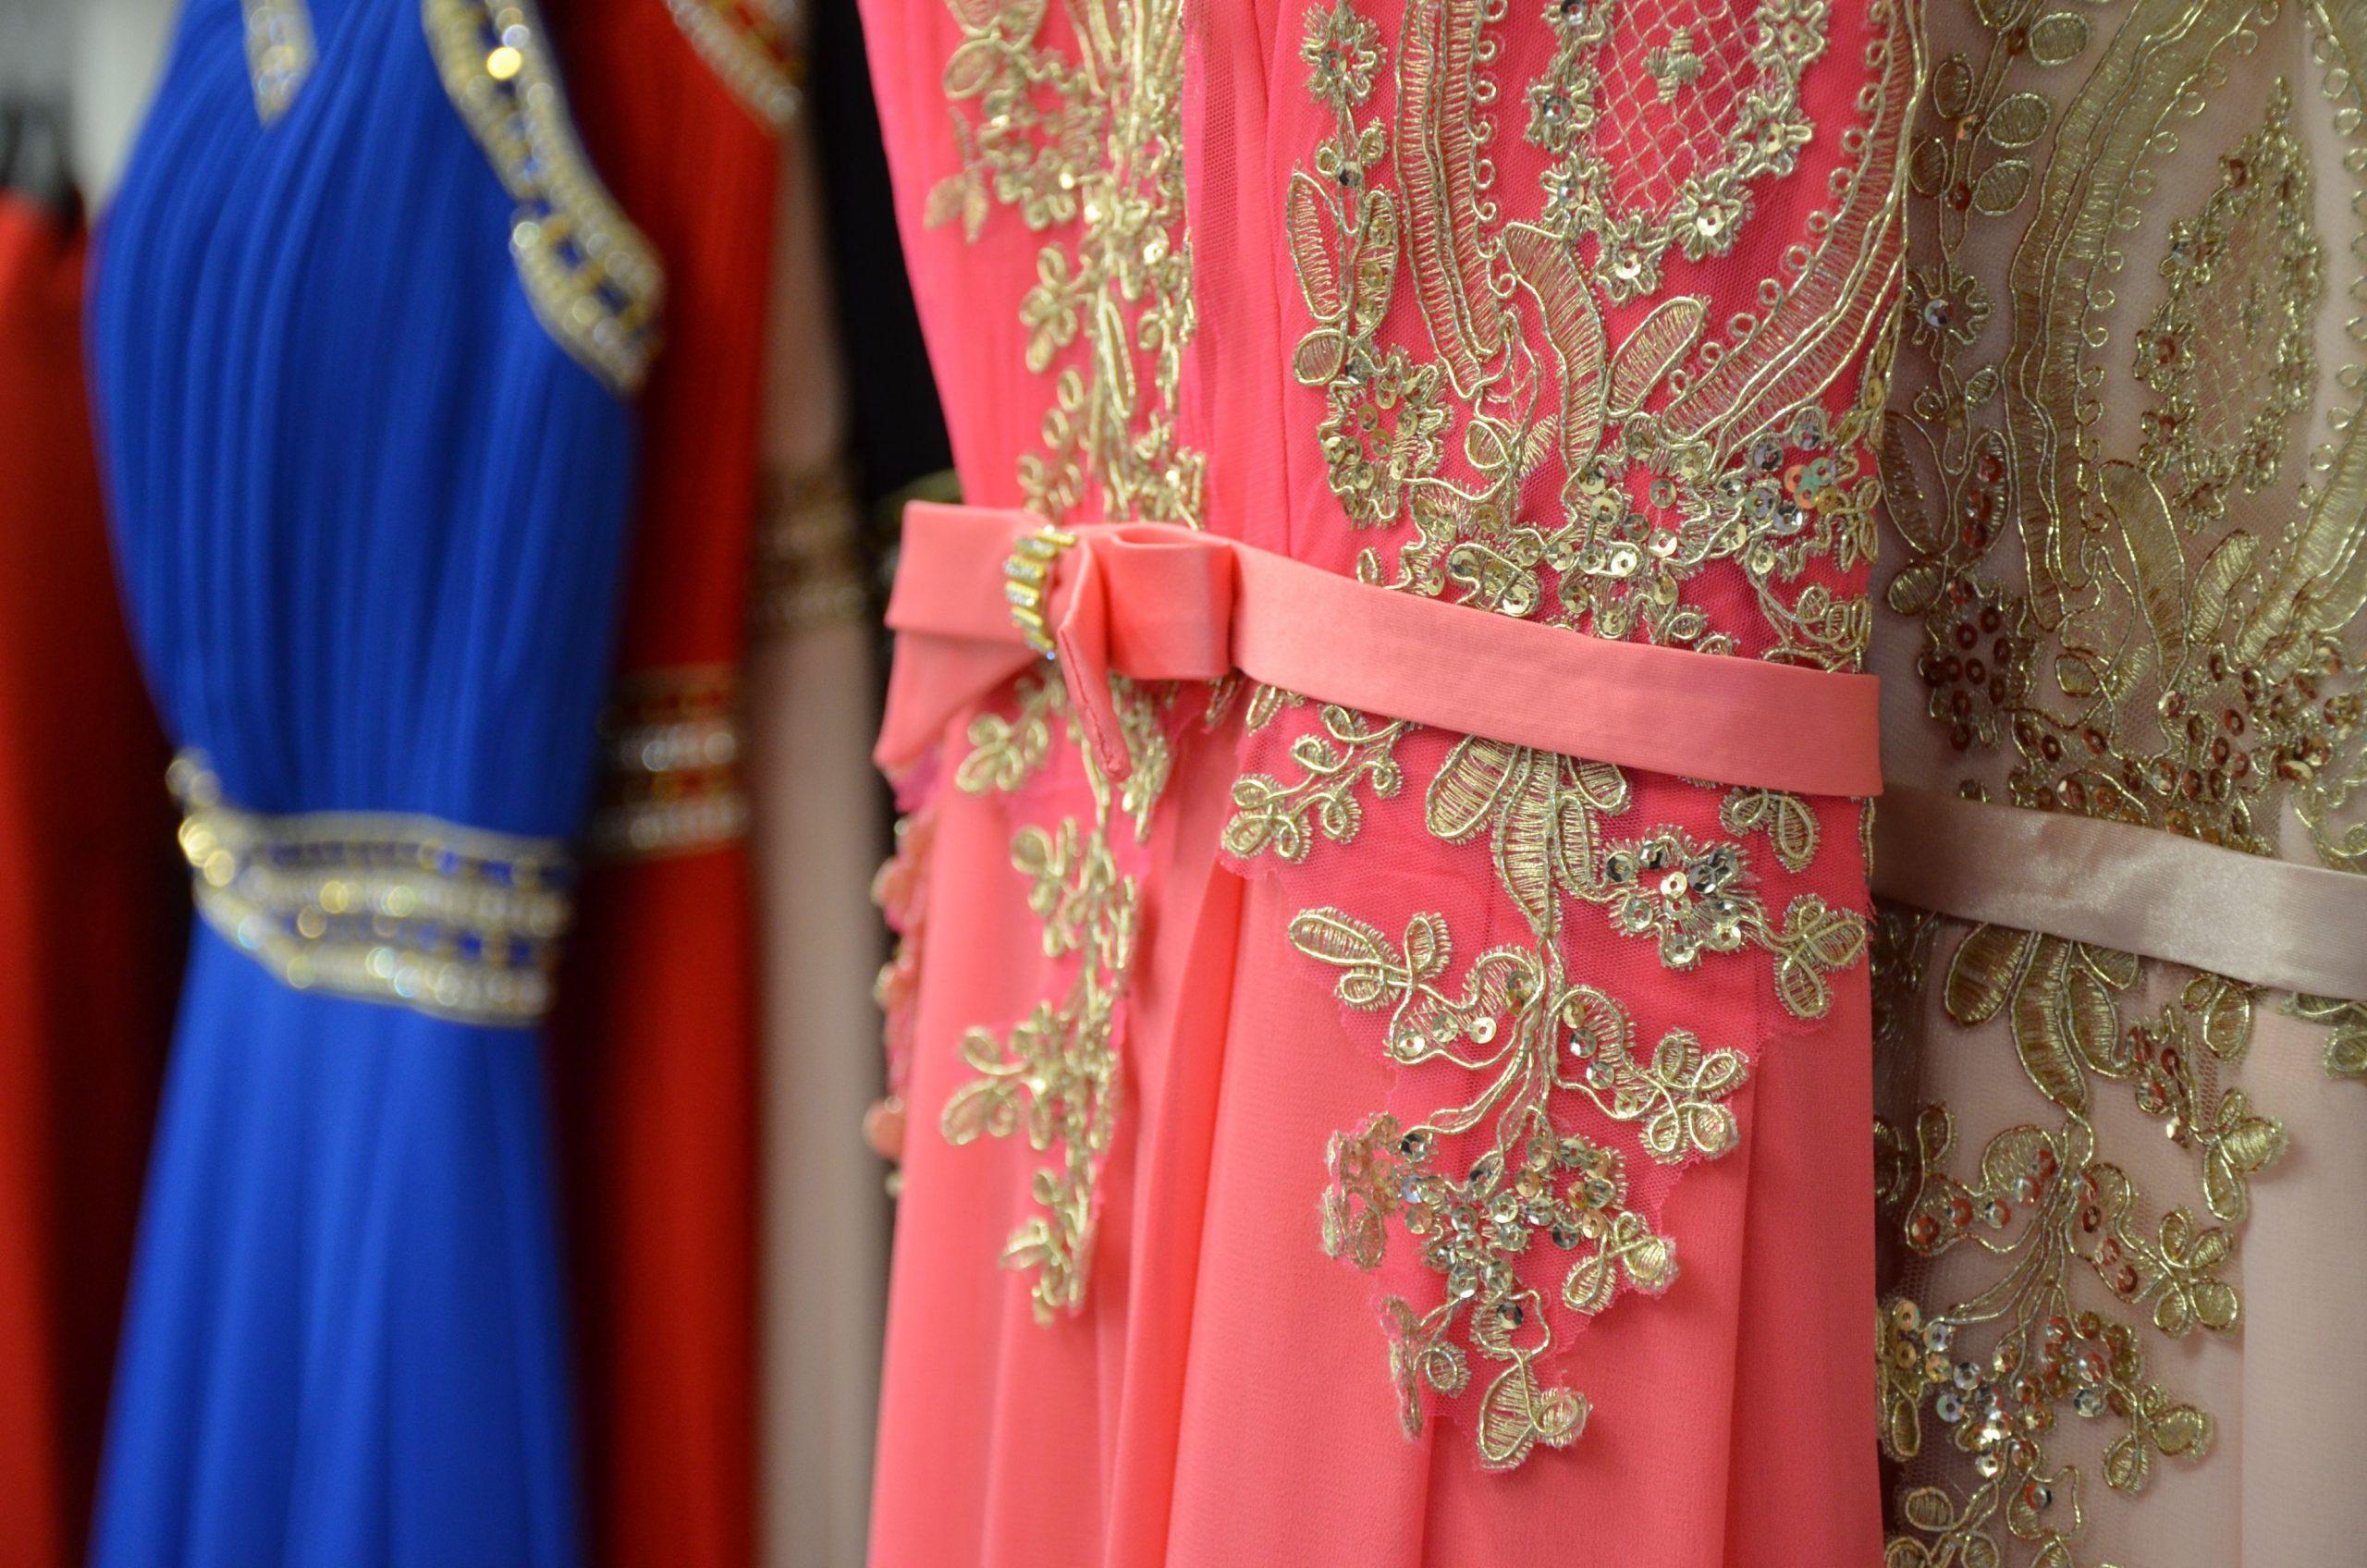 Formal Wunderbar Abendkleider In Stuttgart Vertrieb10 Erstaunlich Abendkleider In Stuttgart Vertrieb